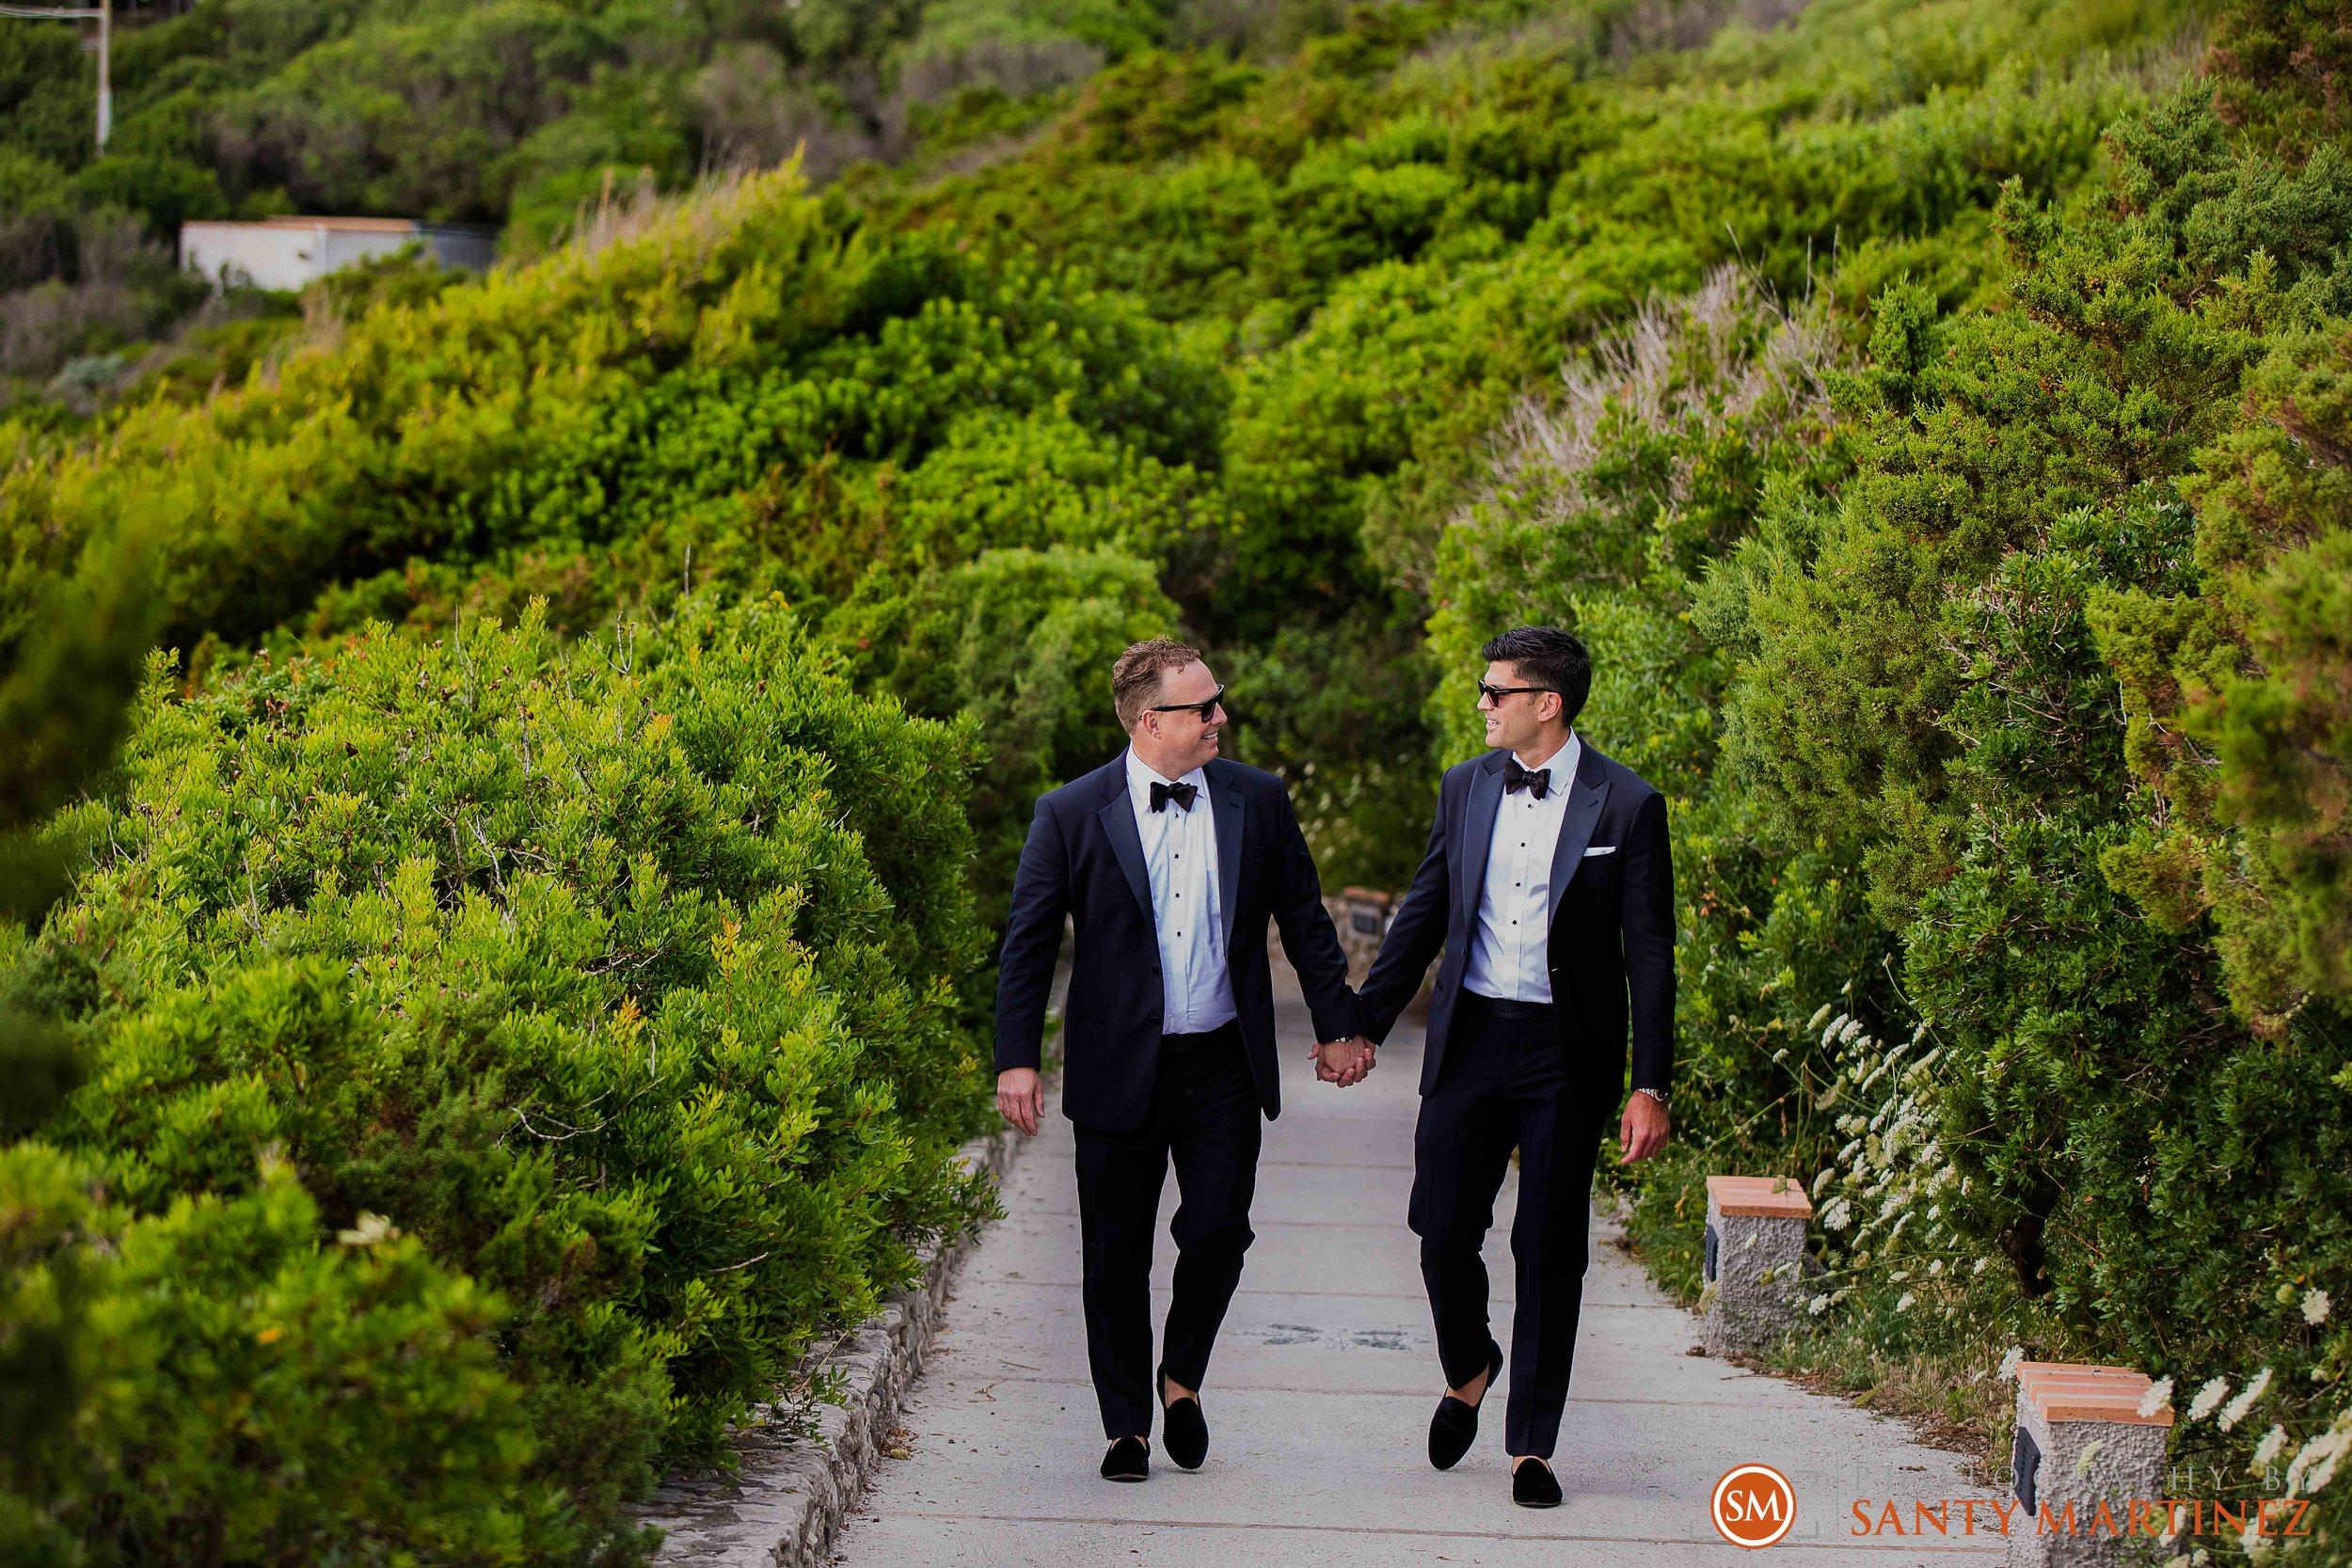 Wedding Capri Italy - Photography by Santy Martinez-32.jpg